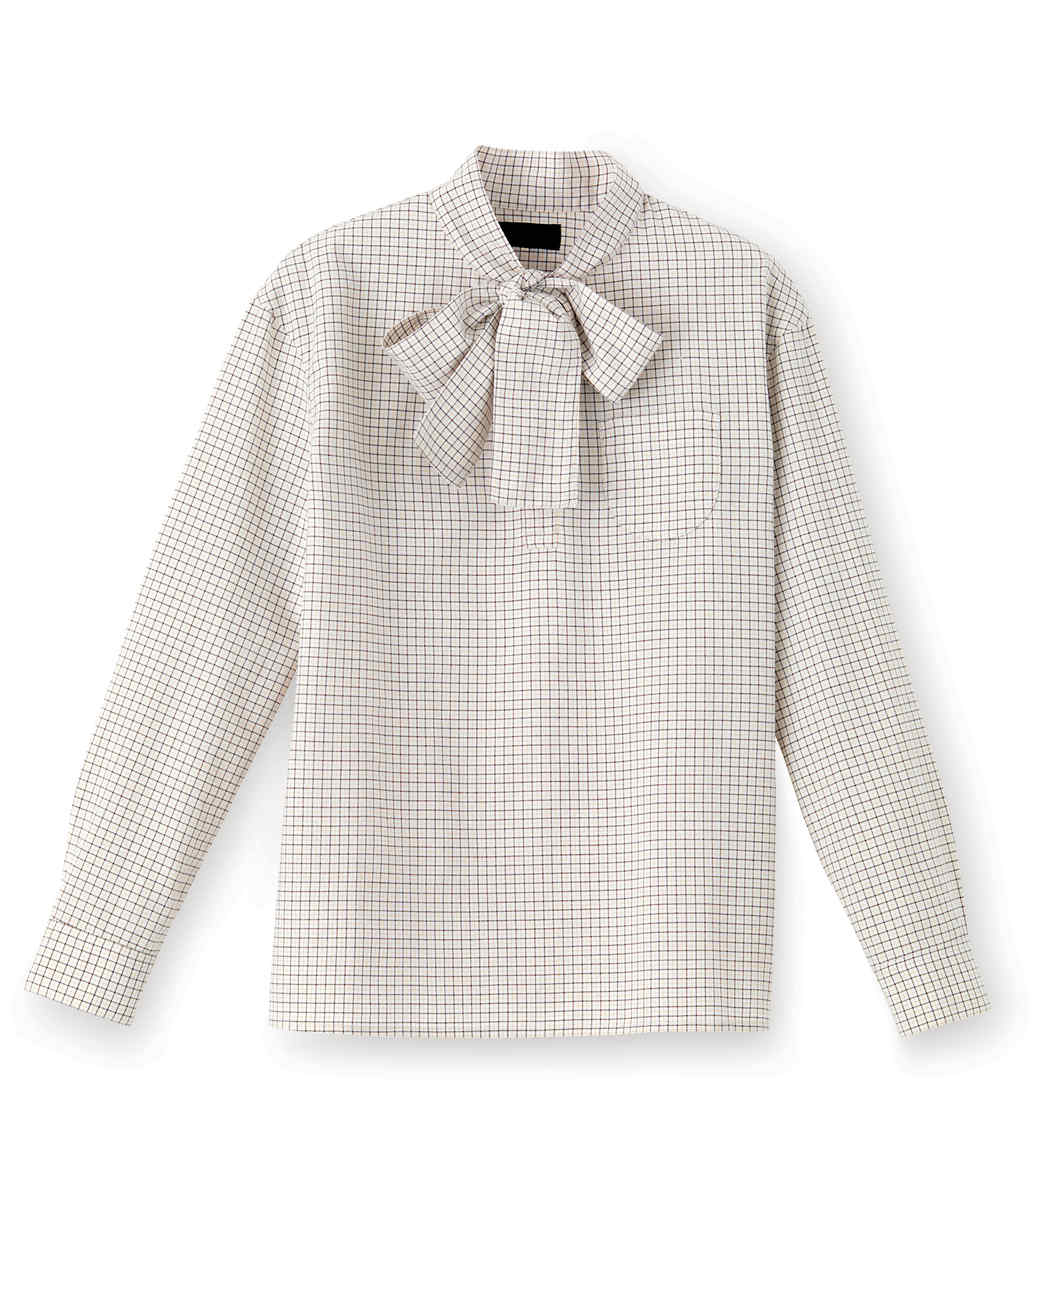 blouse-ms108153.jpg